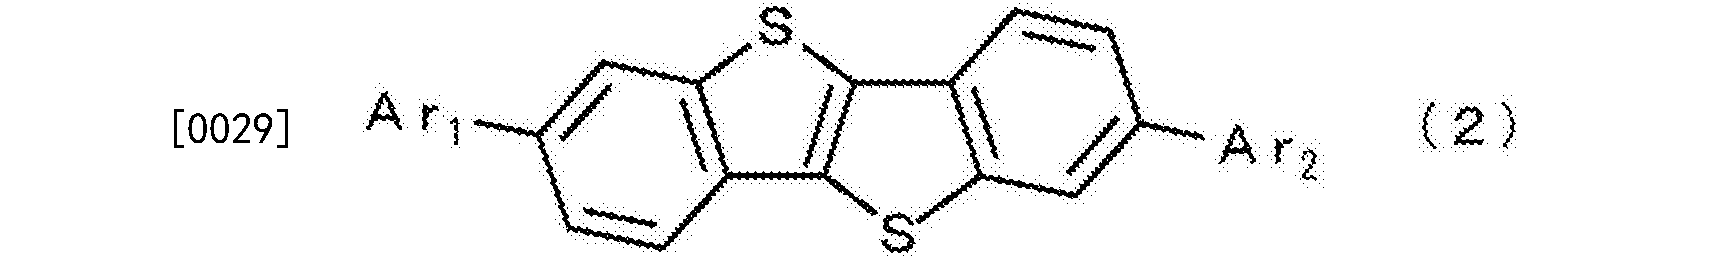 Figure CN107534050AD00072